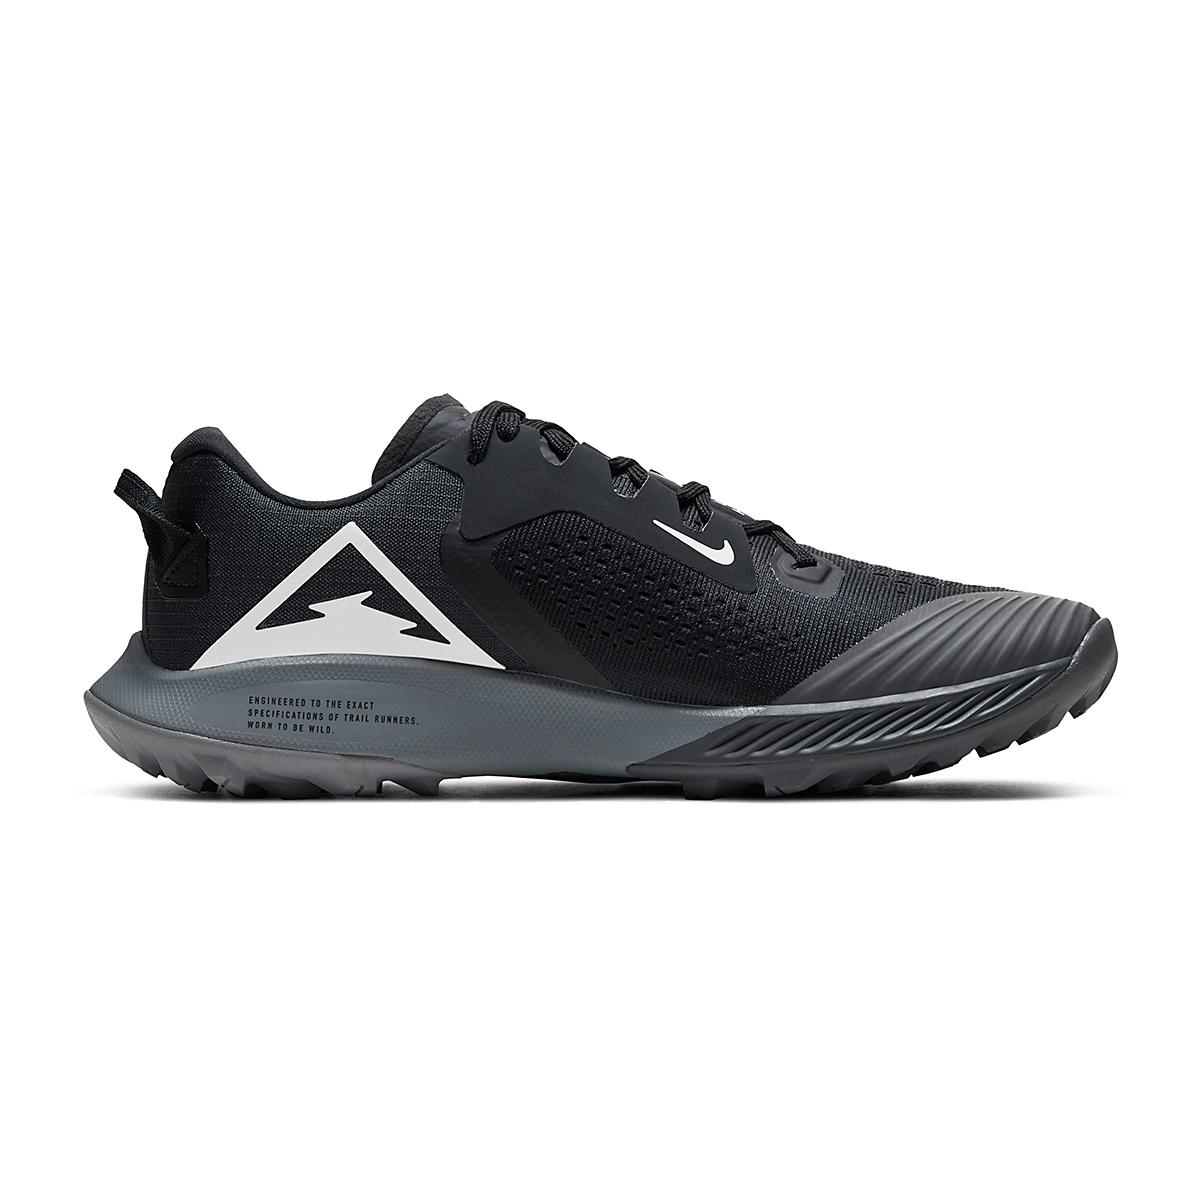 Women's Nike Air Zoom Terra Kiger 6 Trail Running Shoe - Color: Off Noir/Black/Iron Grey/Spruce Aura - Size: 5 - Width: Regular, Off Noir/Black/Iron Grey/Spruce Aura, large, image 2